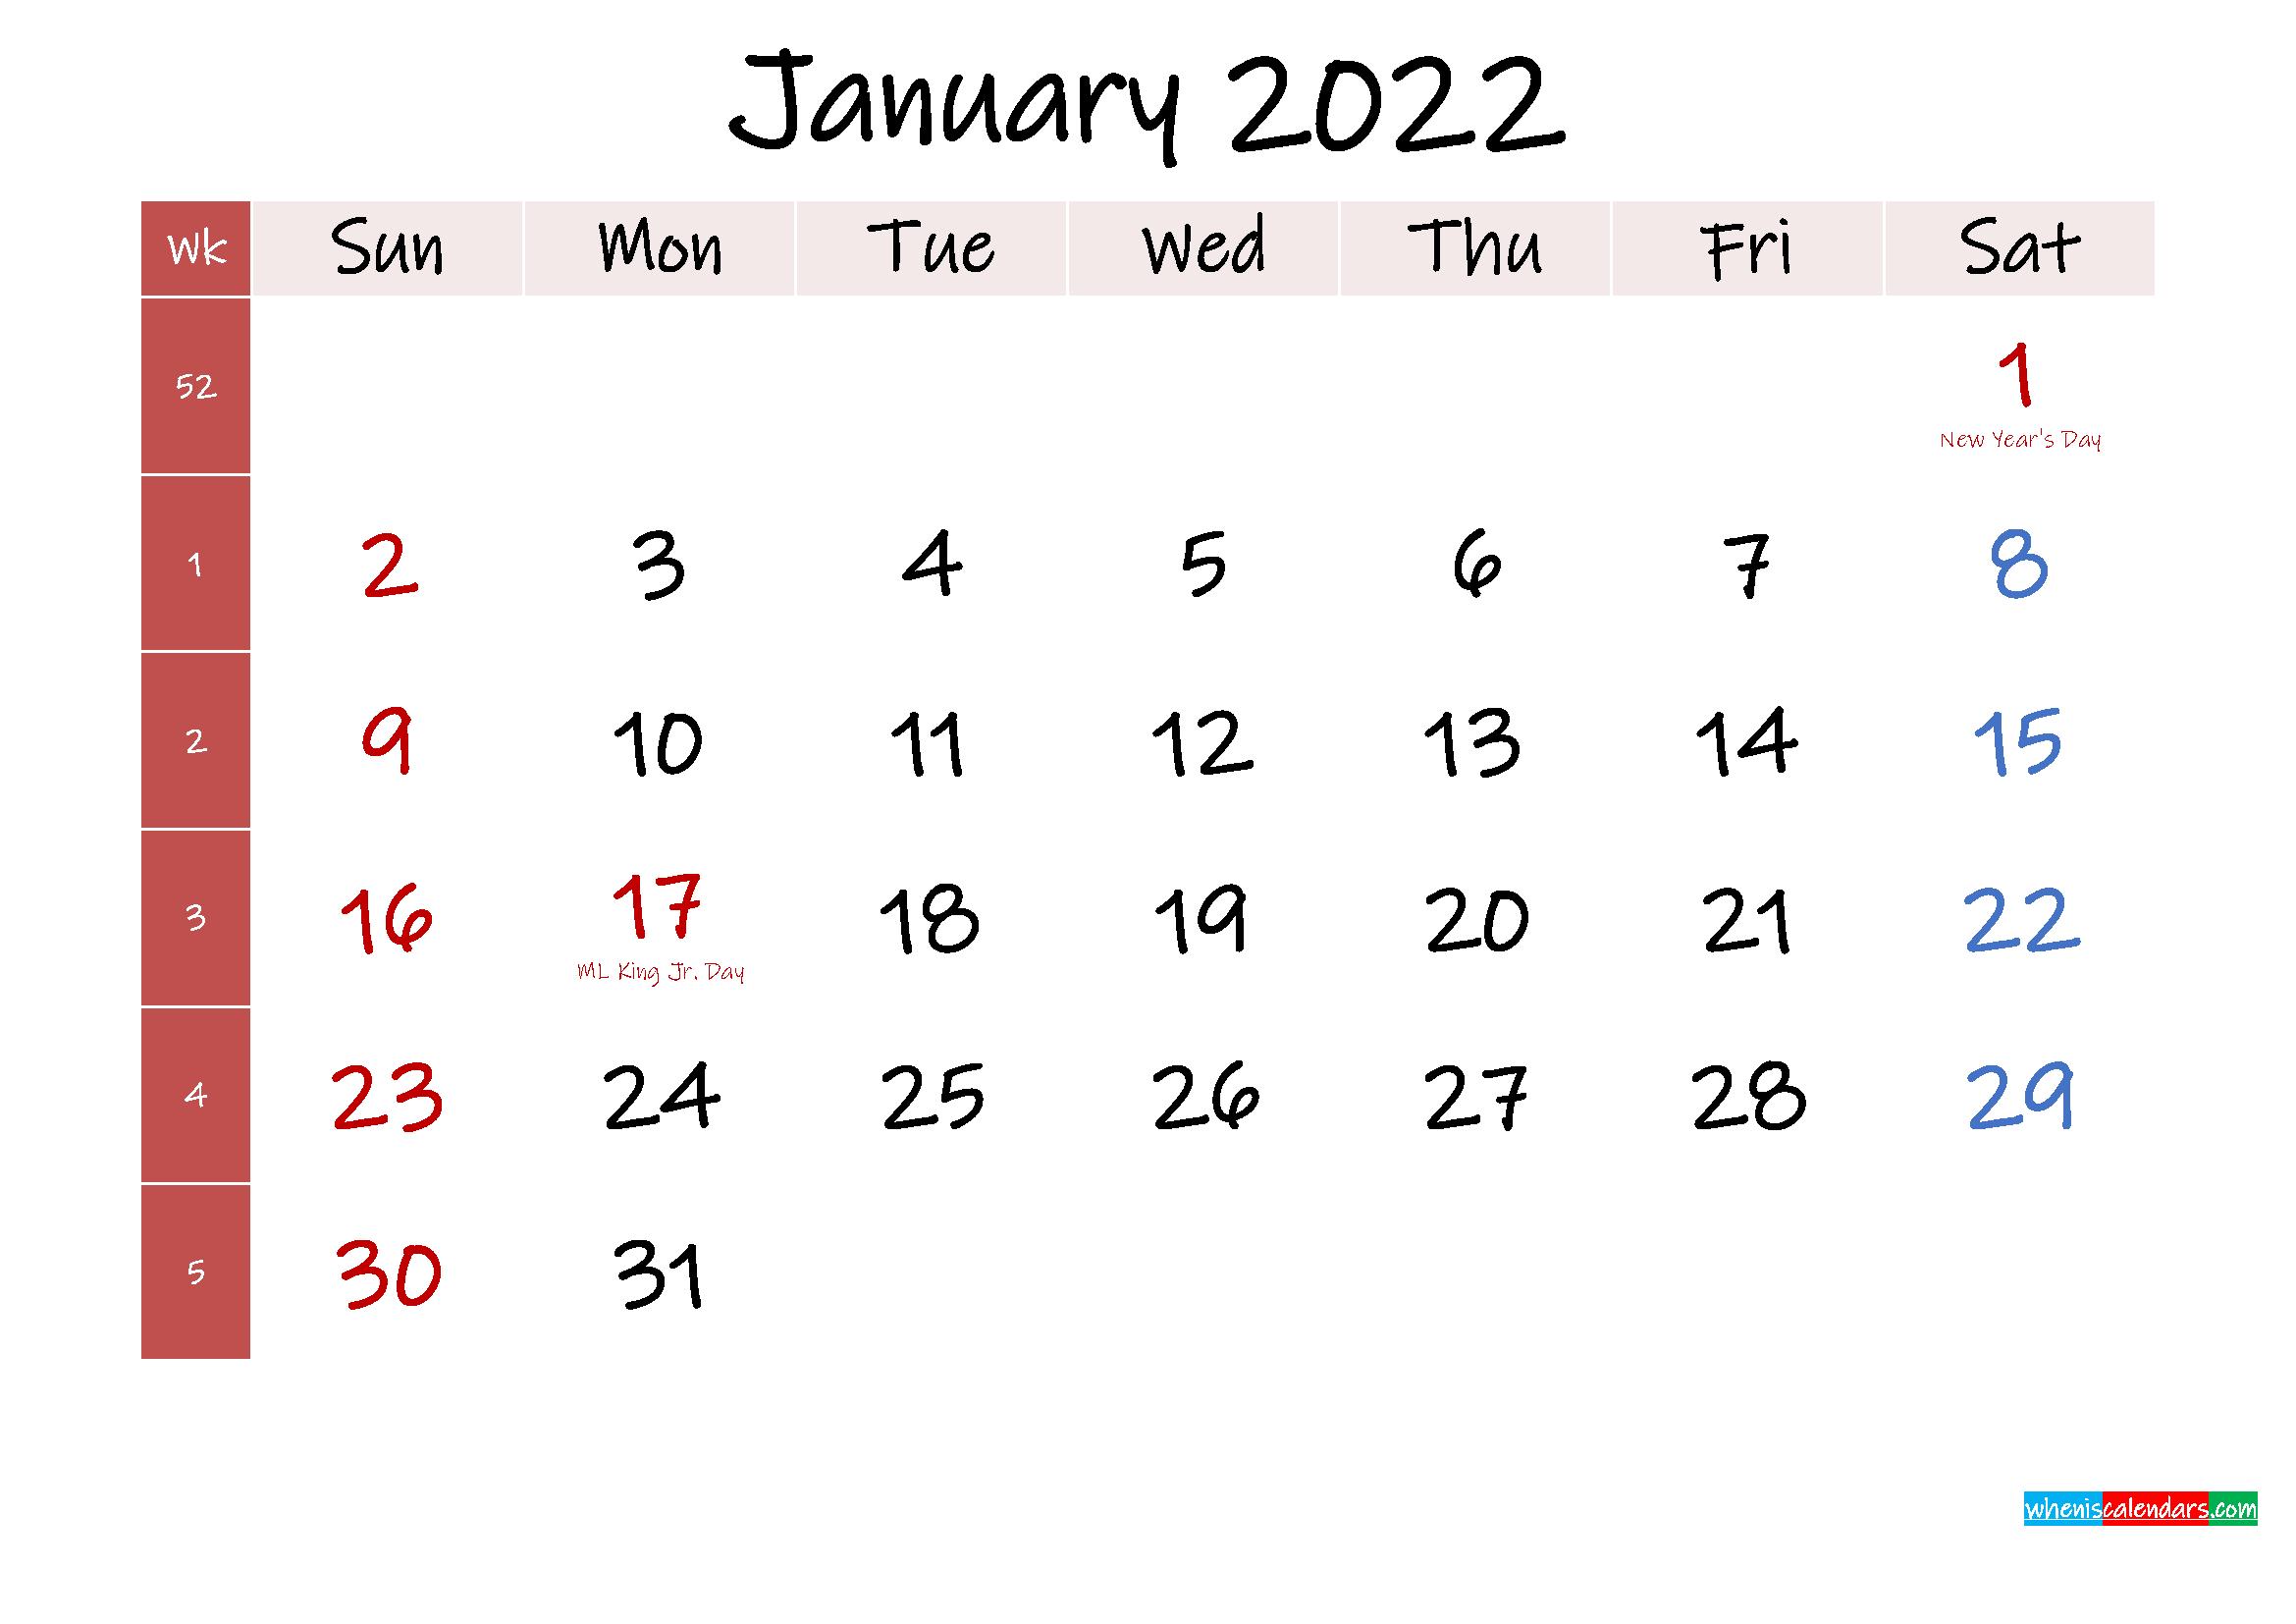 January 2022 Free Printable Calendar